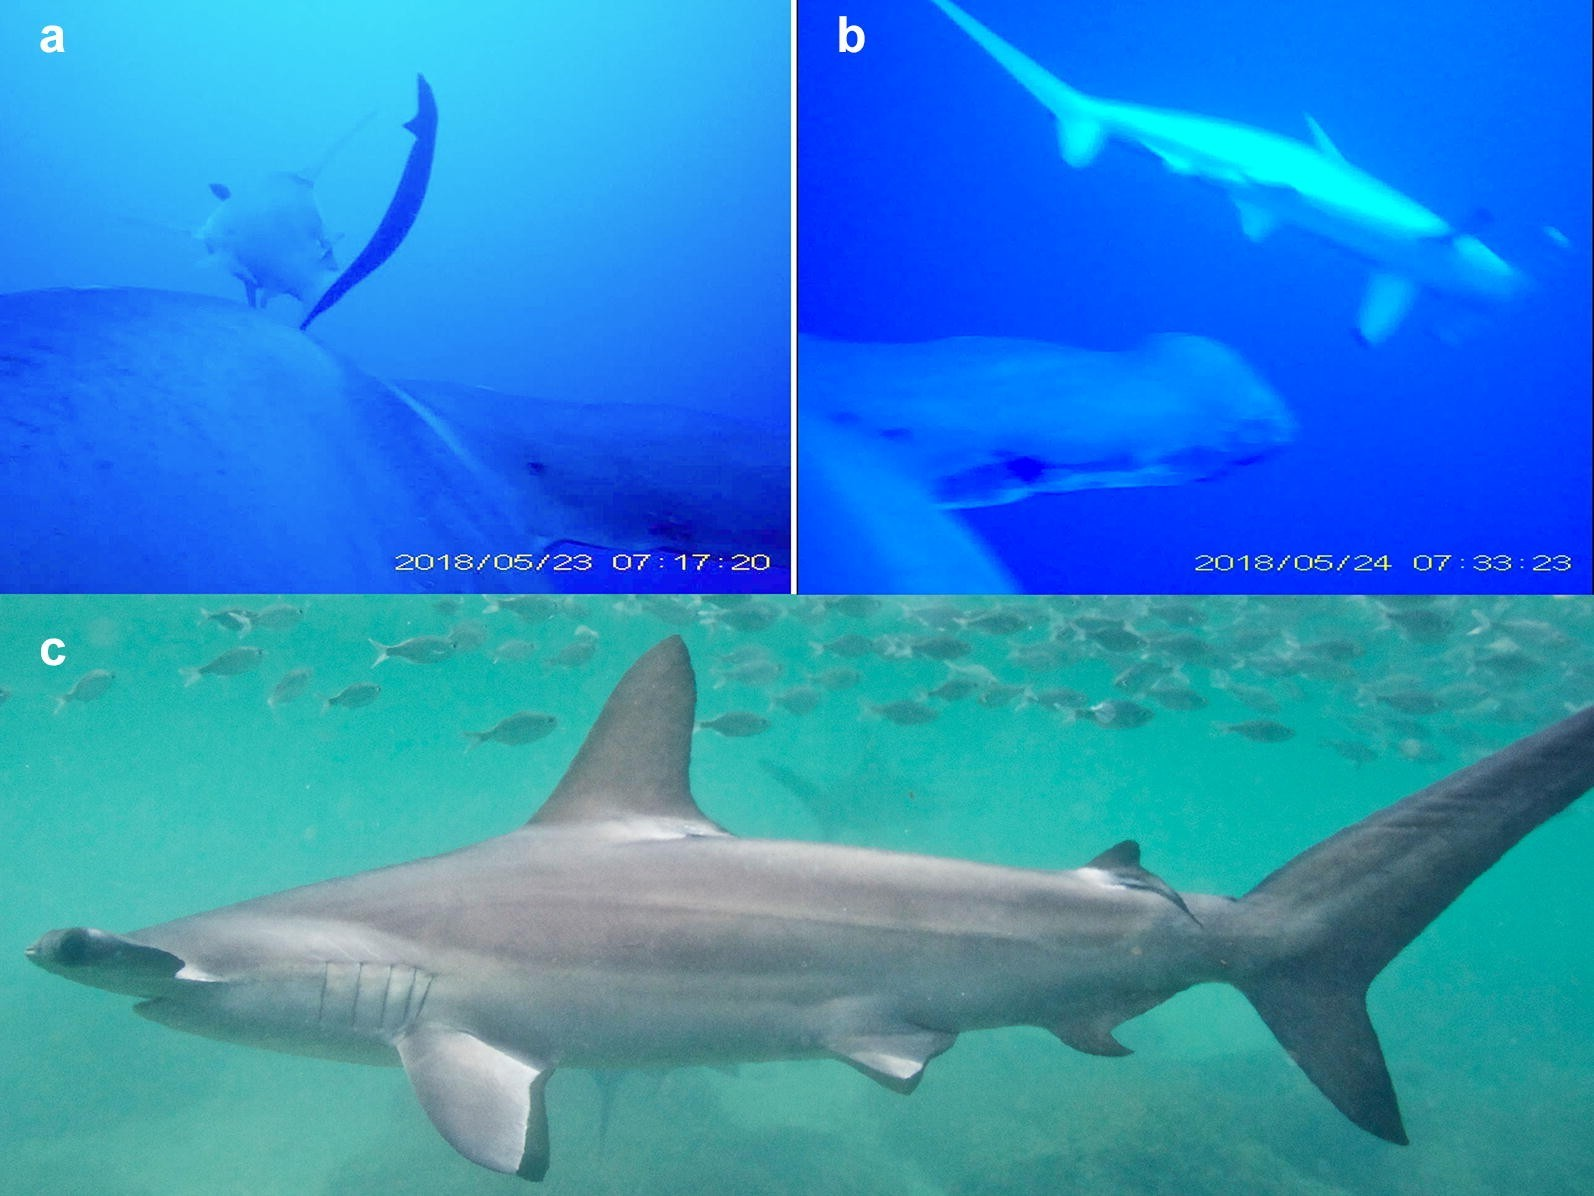 Scalloped Hammerhead Sharks Swim on Their Side